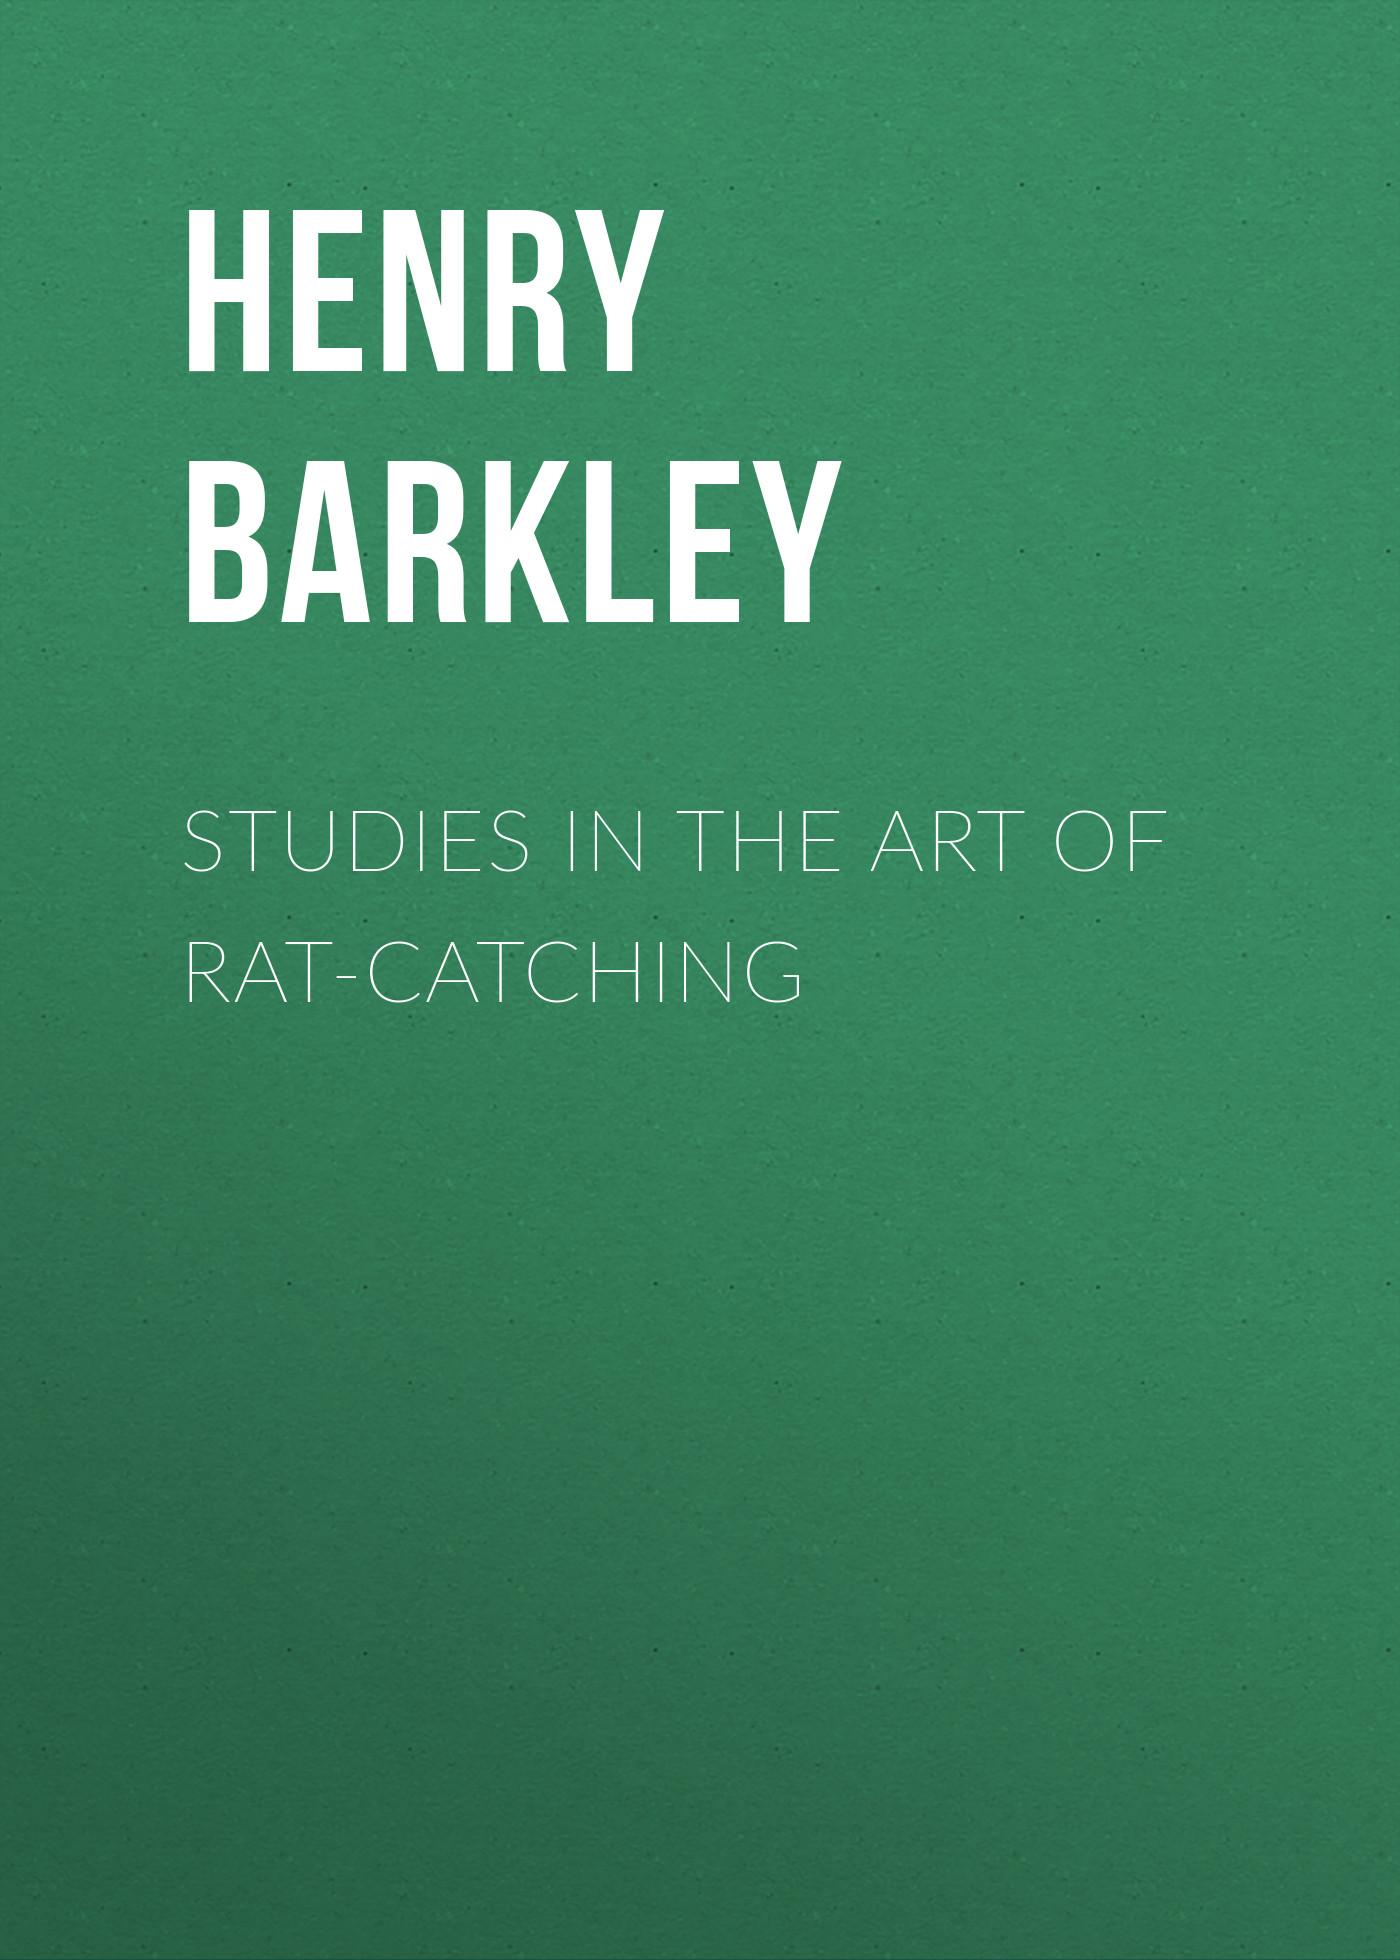 Barkley Henry C. Studies in the Art of Rat-catching